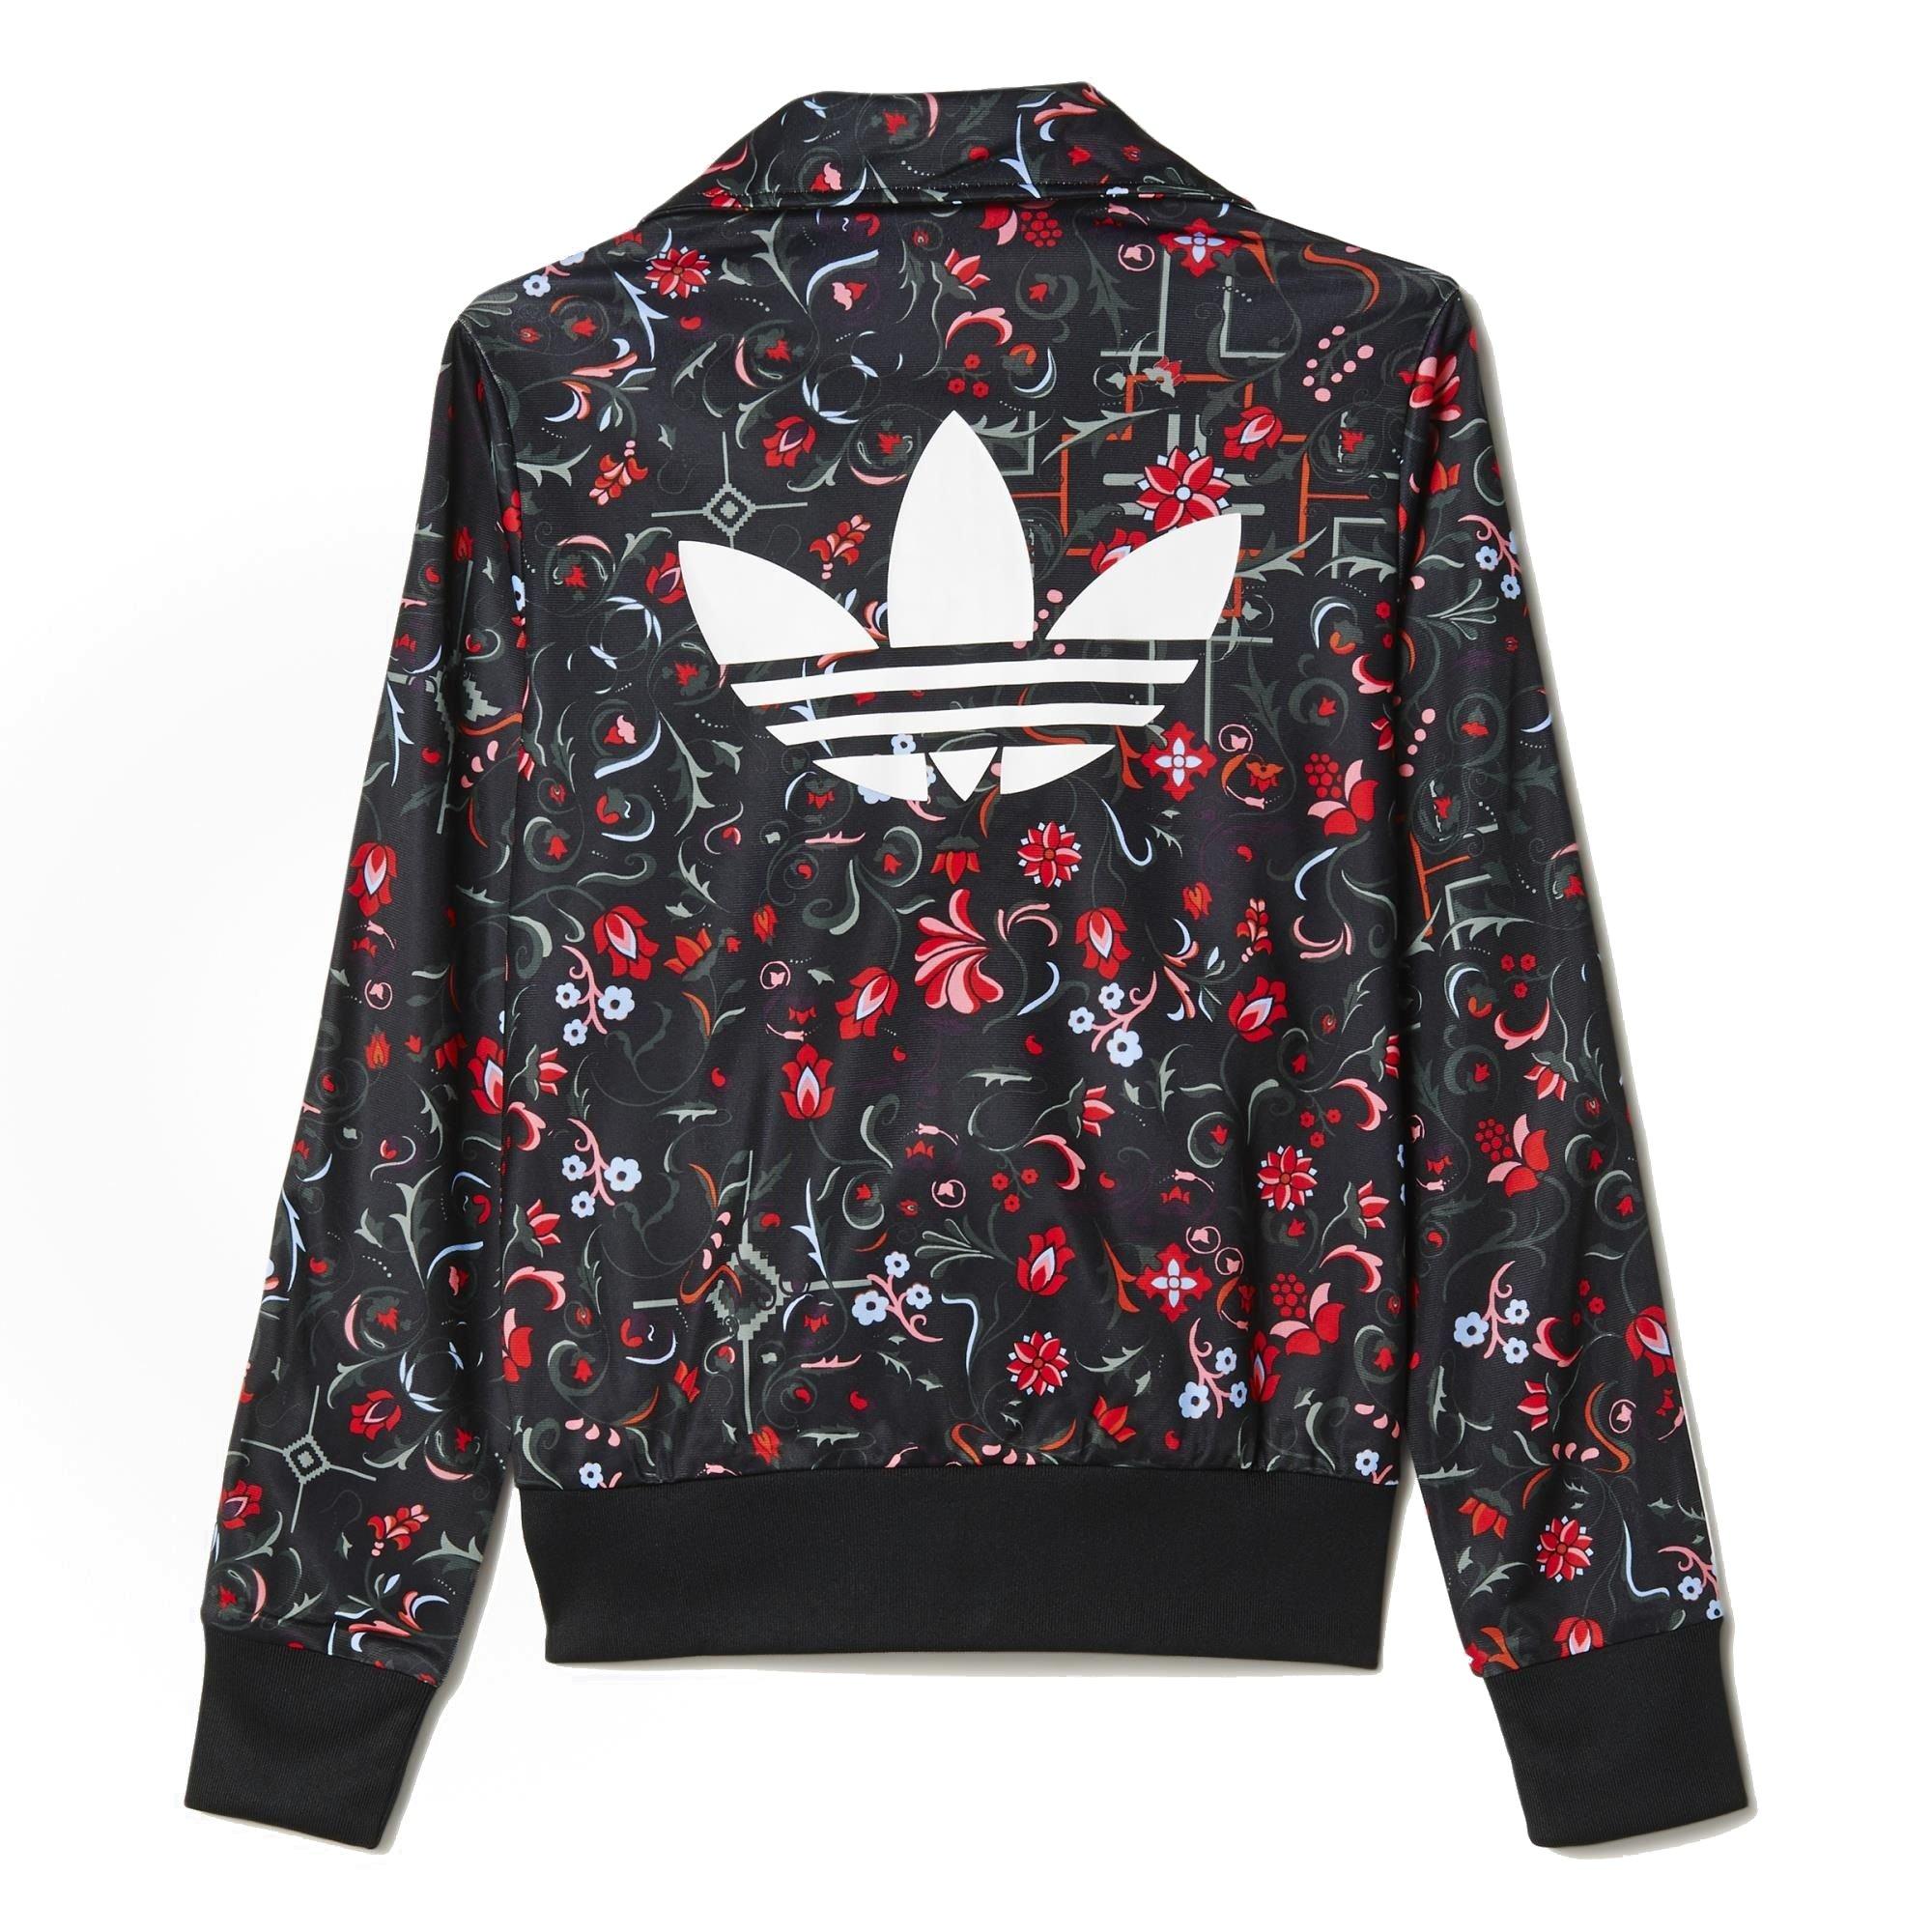 Adidas Originals Mujer 2015